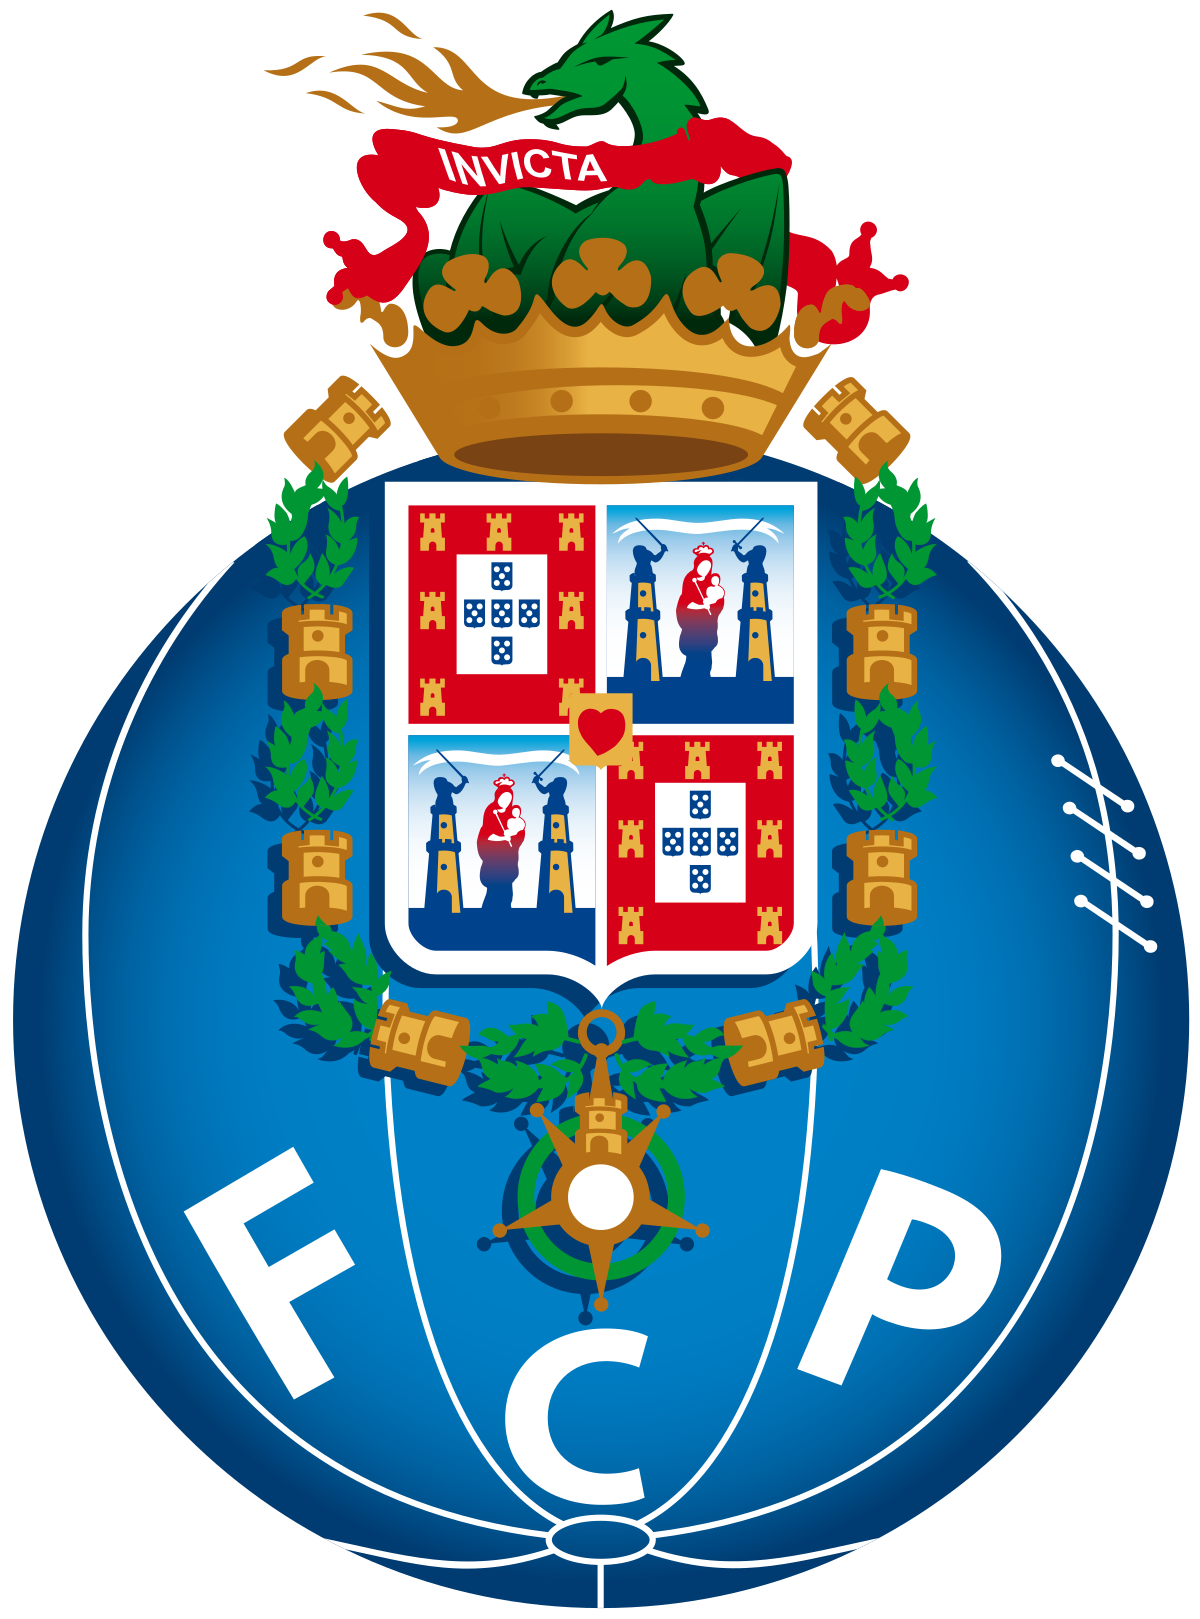 Football stadium crowd clipart vector freeuse library FC Porto - Wikipedia vector freeuse library